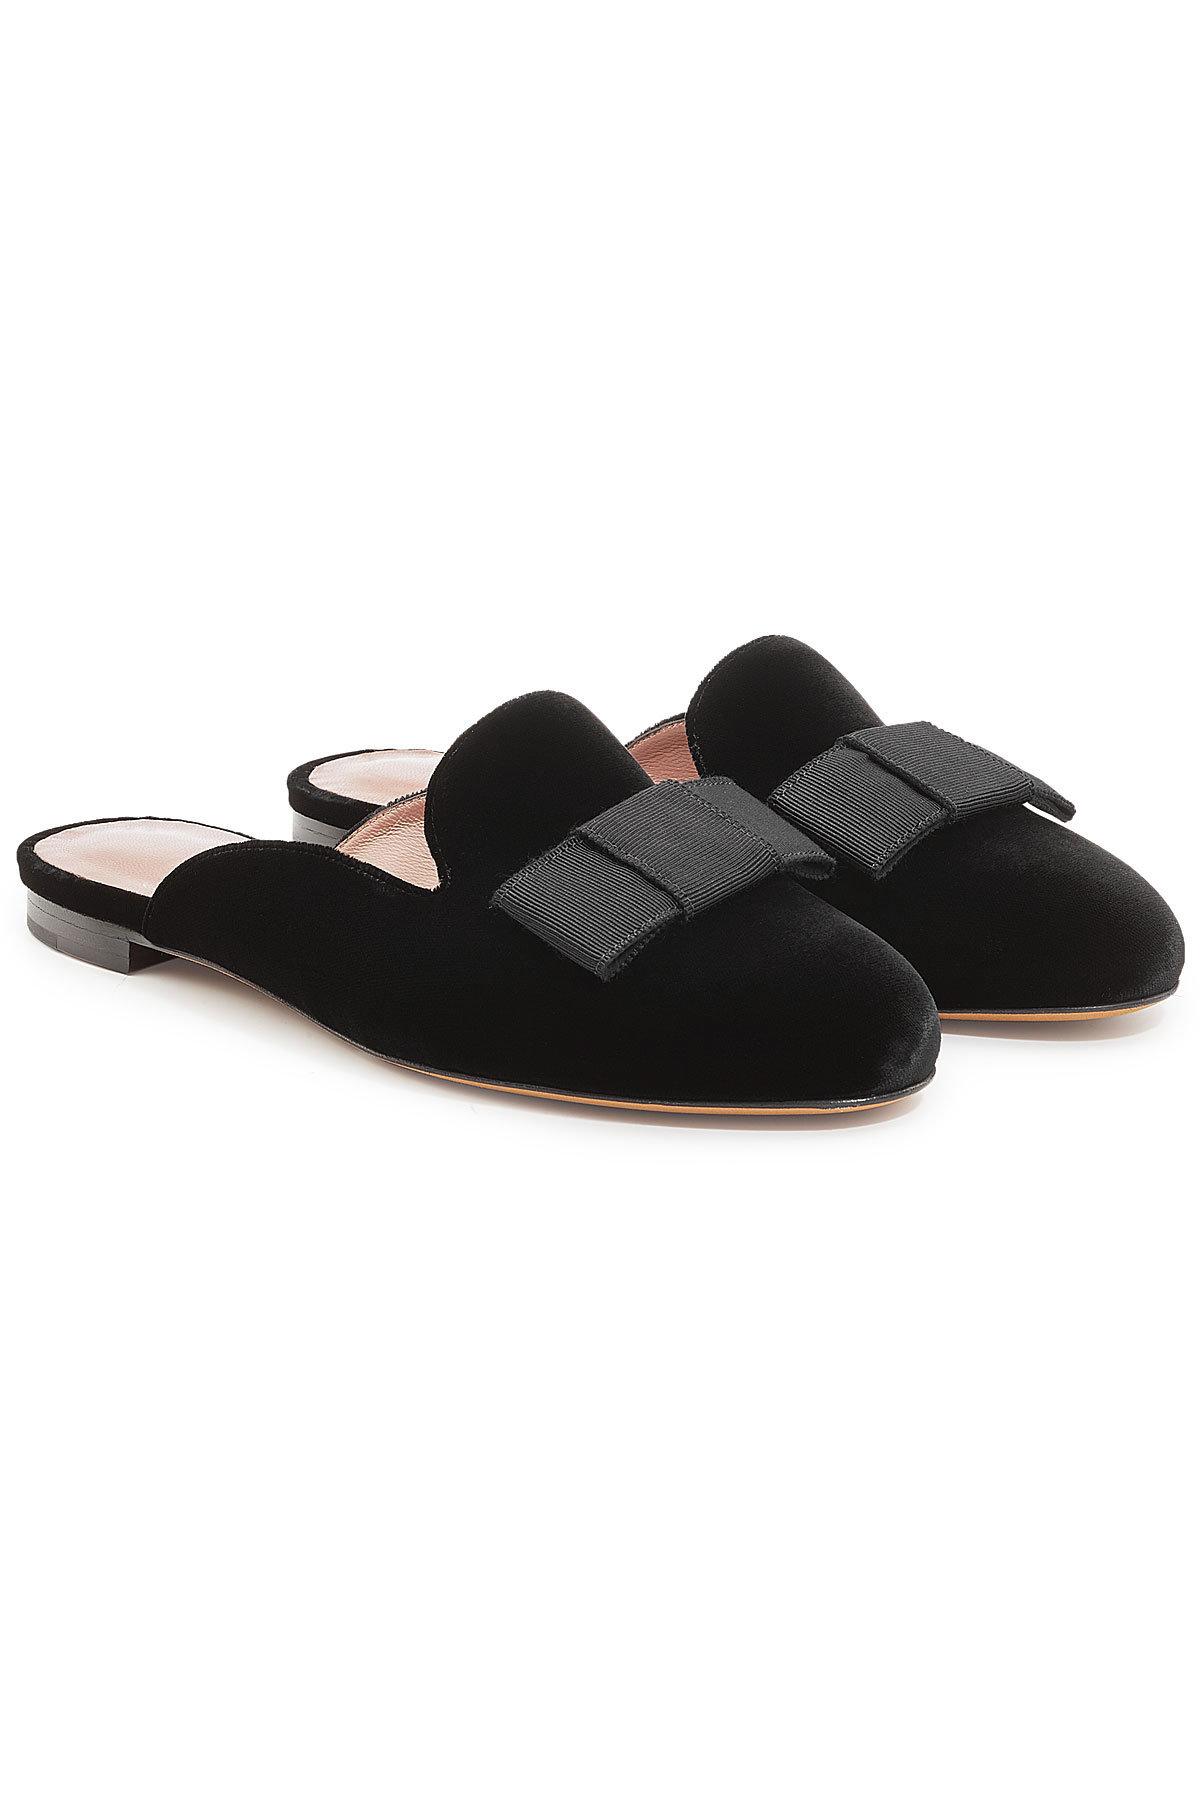 Tabitha Simmons Cleo Suede Sandals Gr. EU 39 8kRX2deq